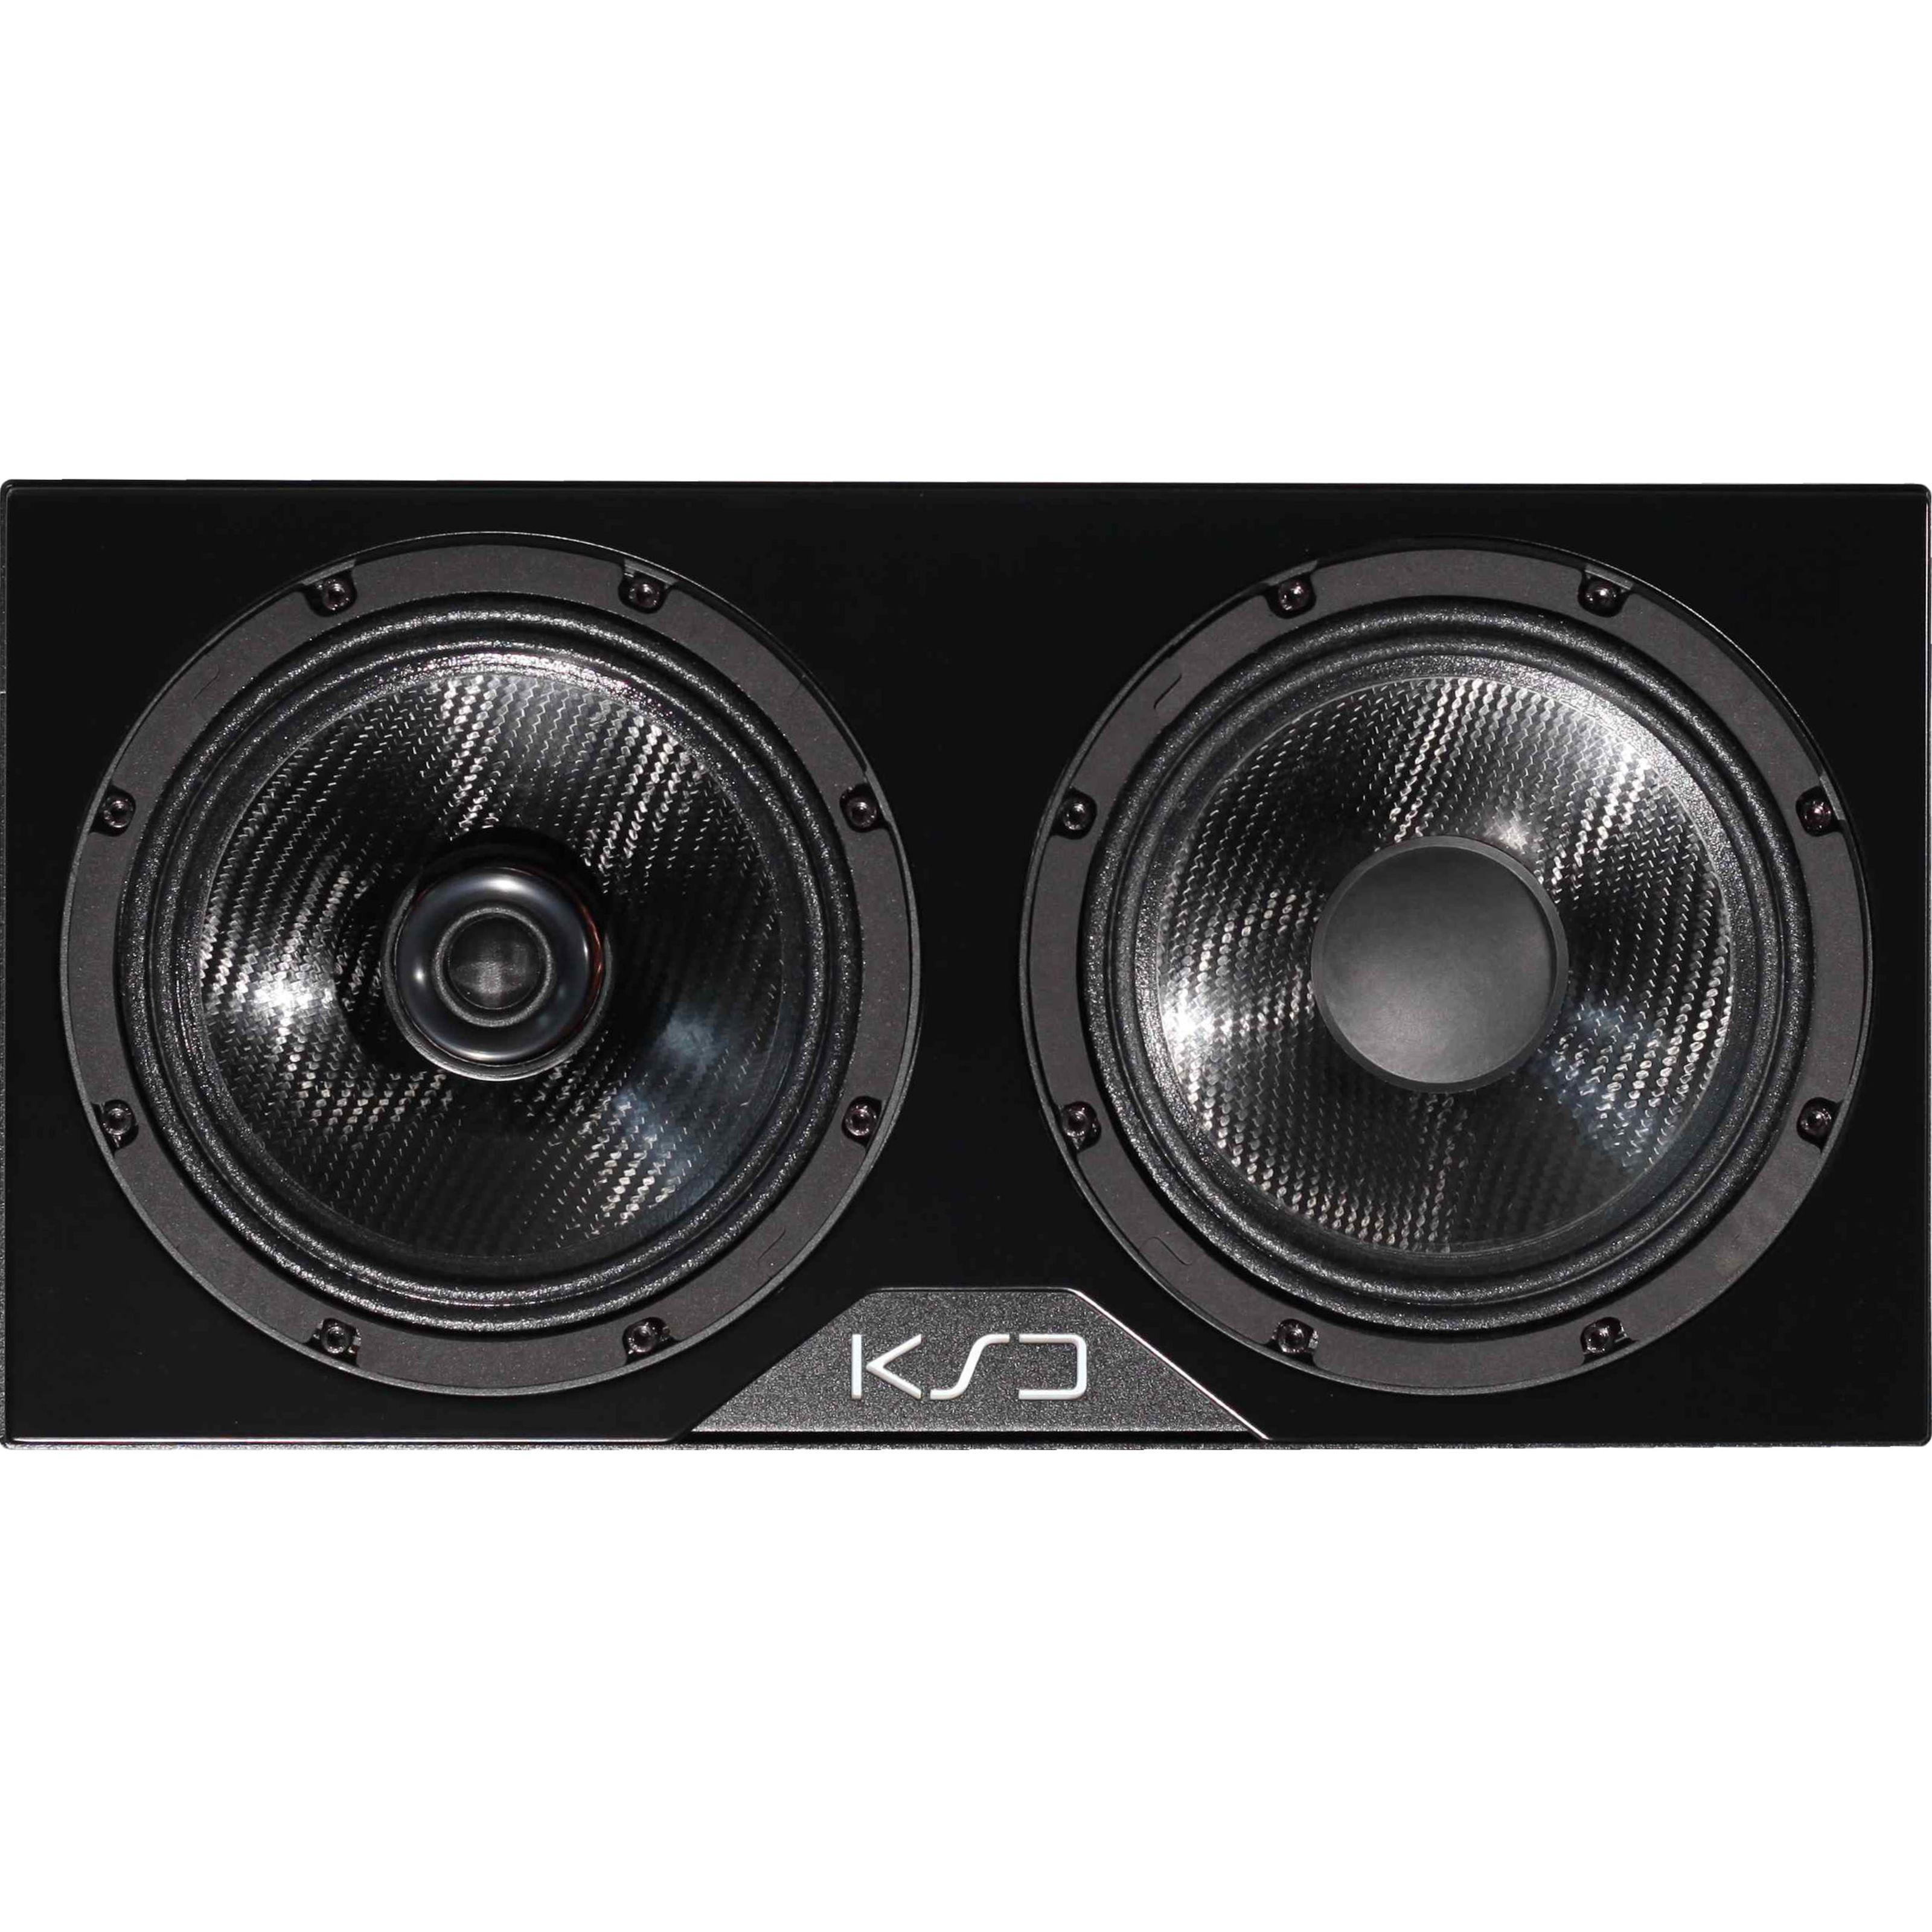 KS-Digital - C88-Reference Black Monitor R 313 right